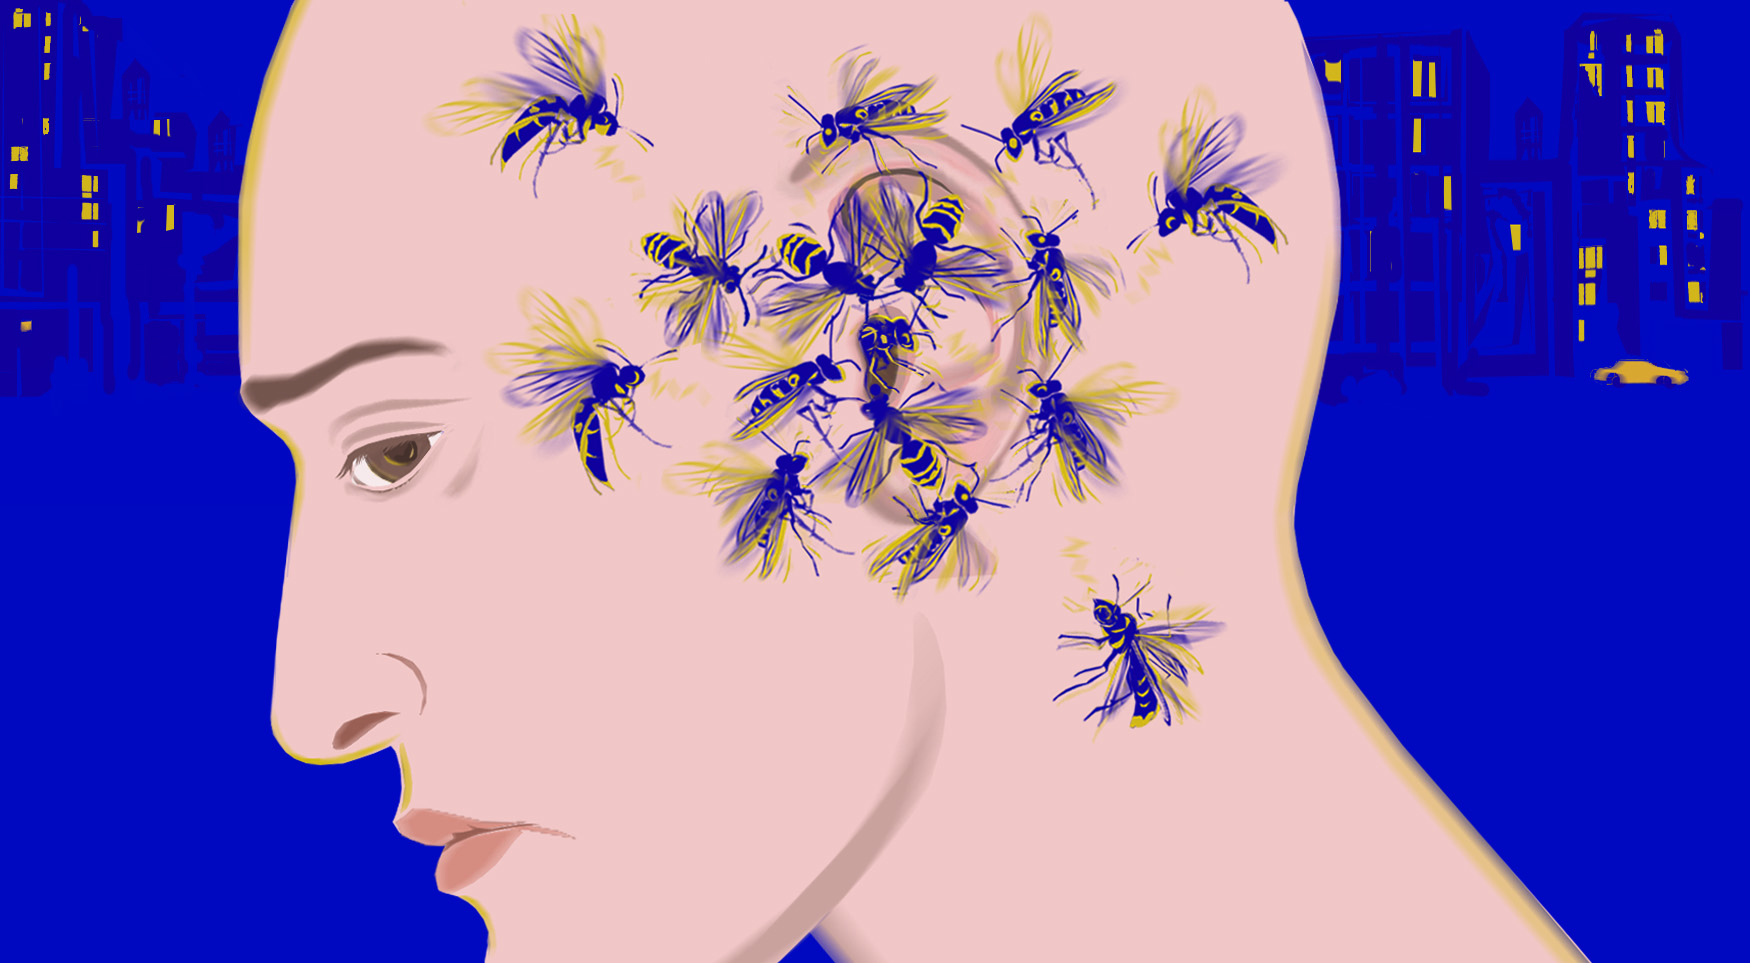 management of tinnitus in ayurveda